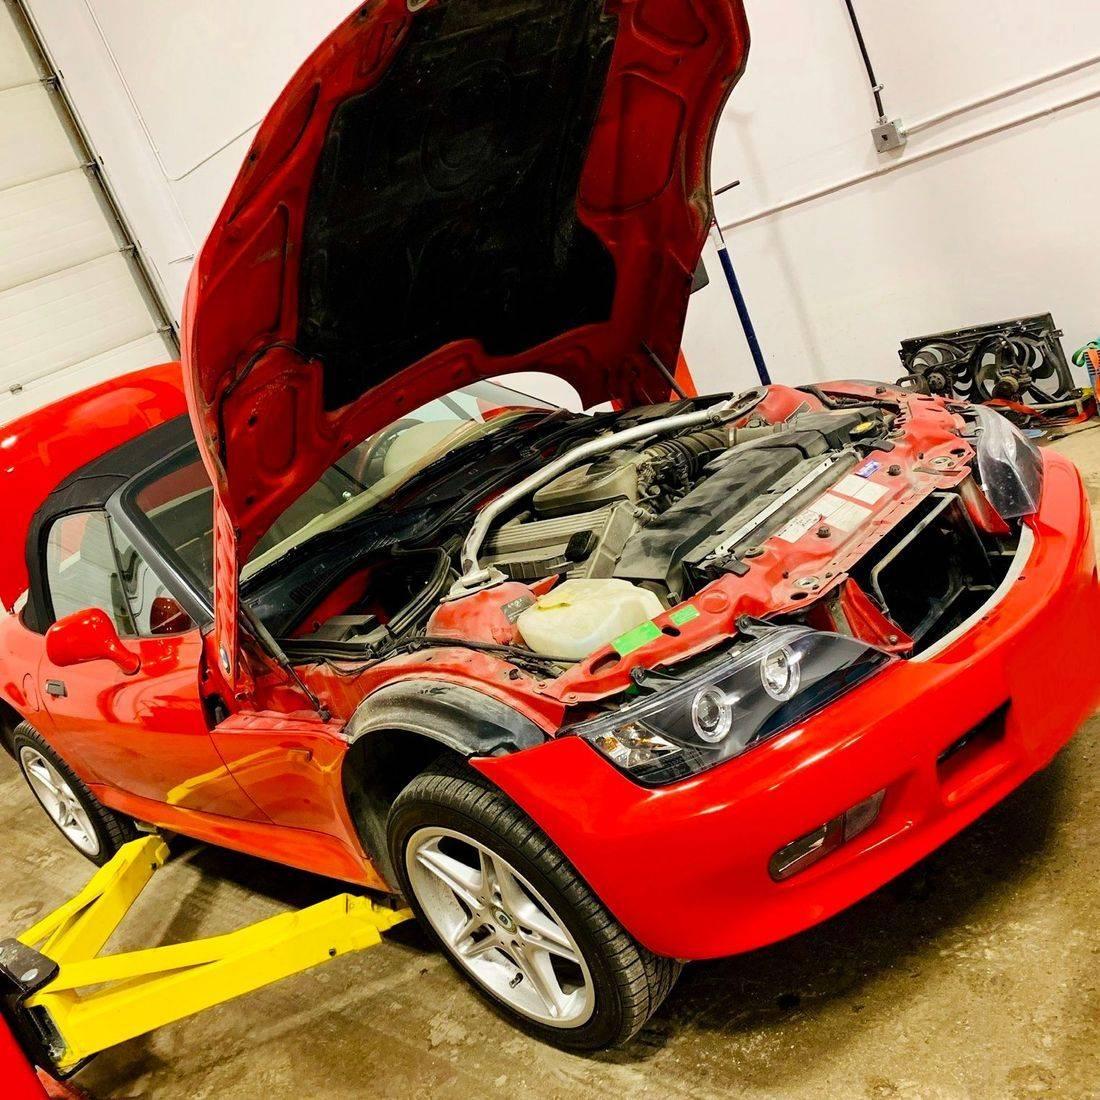 BMW Z3 on the Hoist